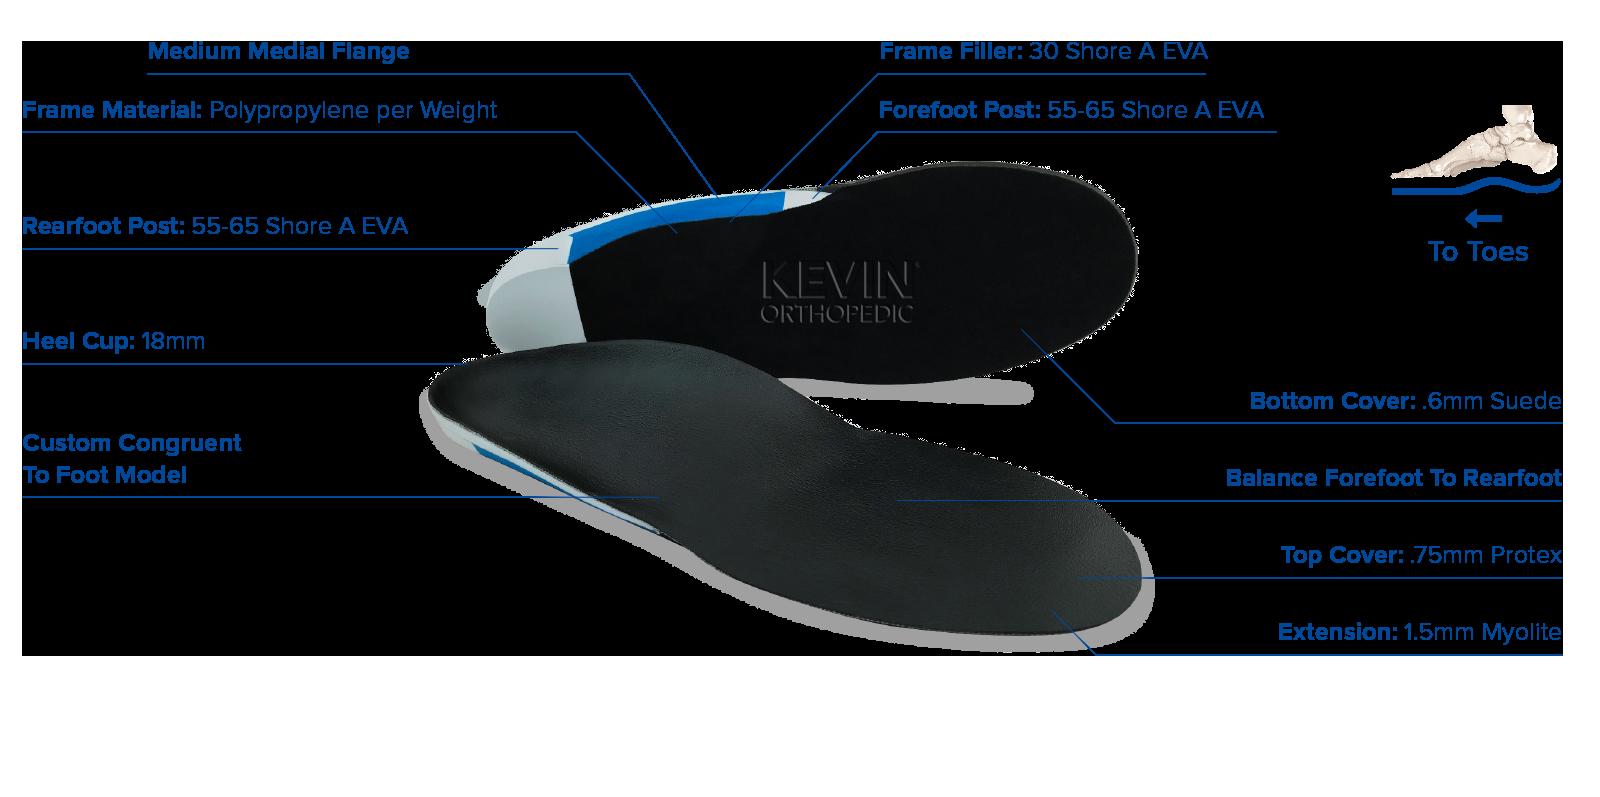 PRODUCT: Advanced _ Pathology _ Pes Planus – Kevin Orthopedic